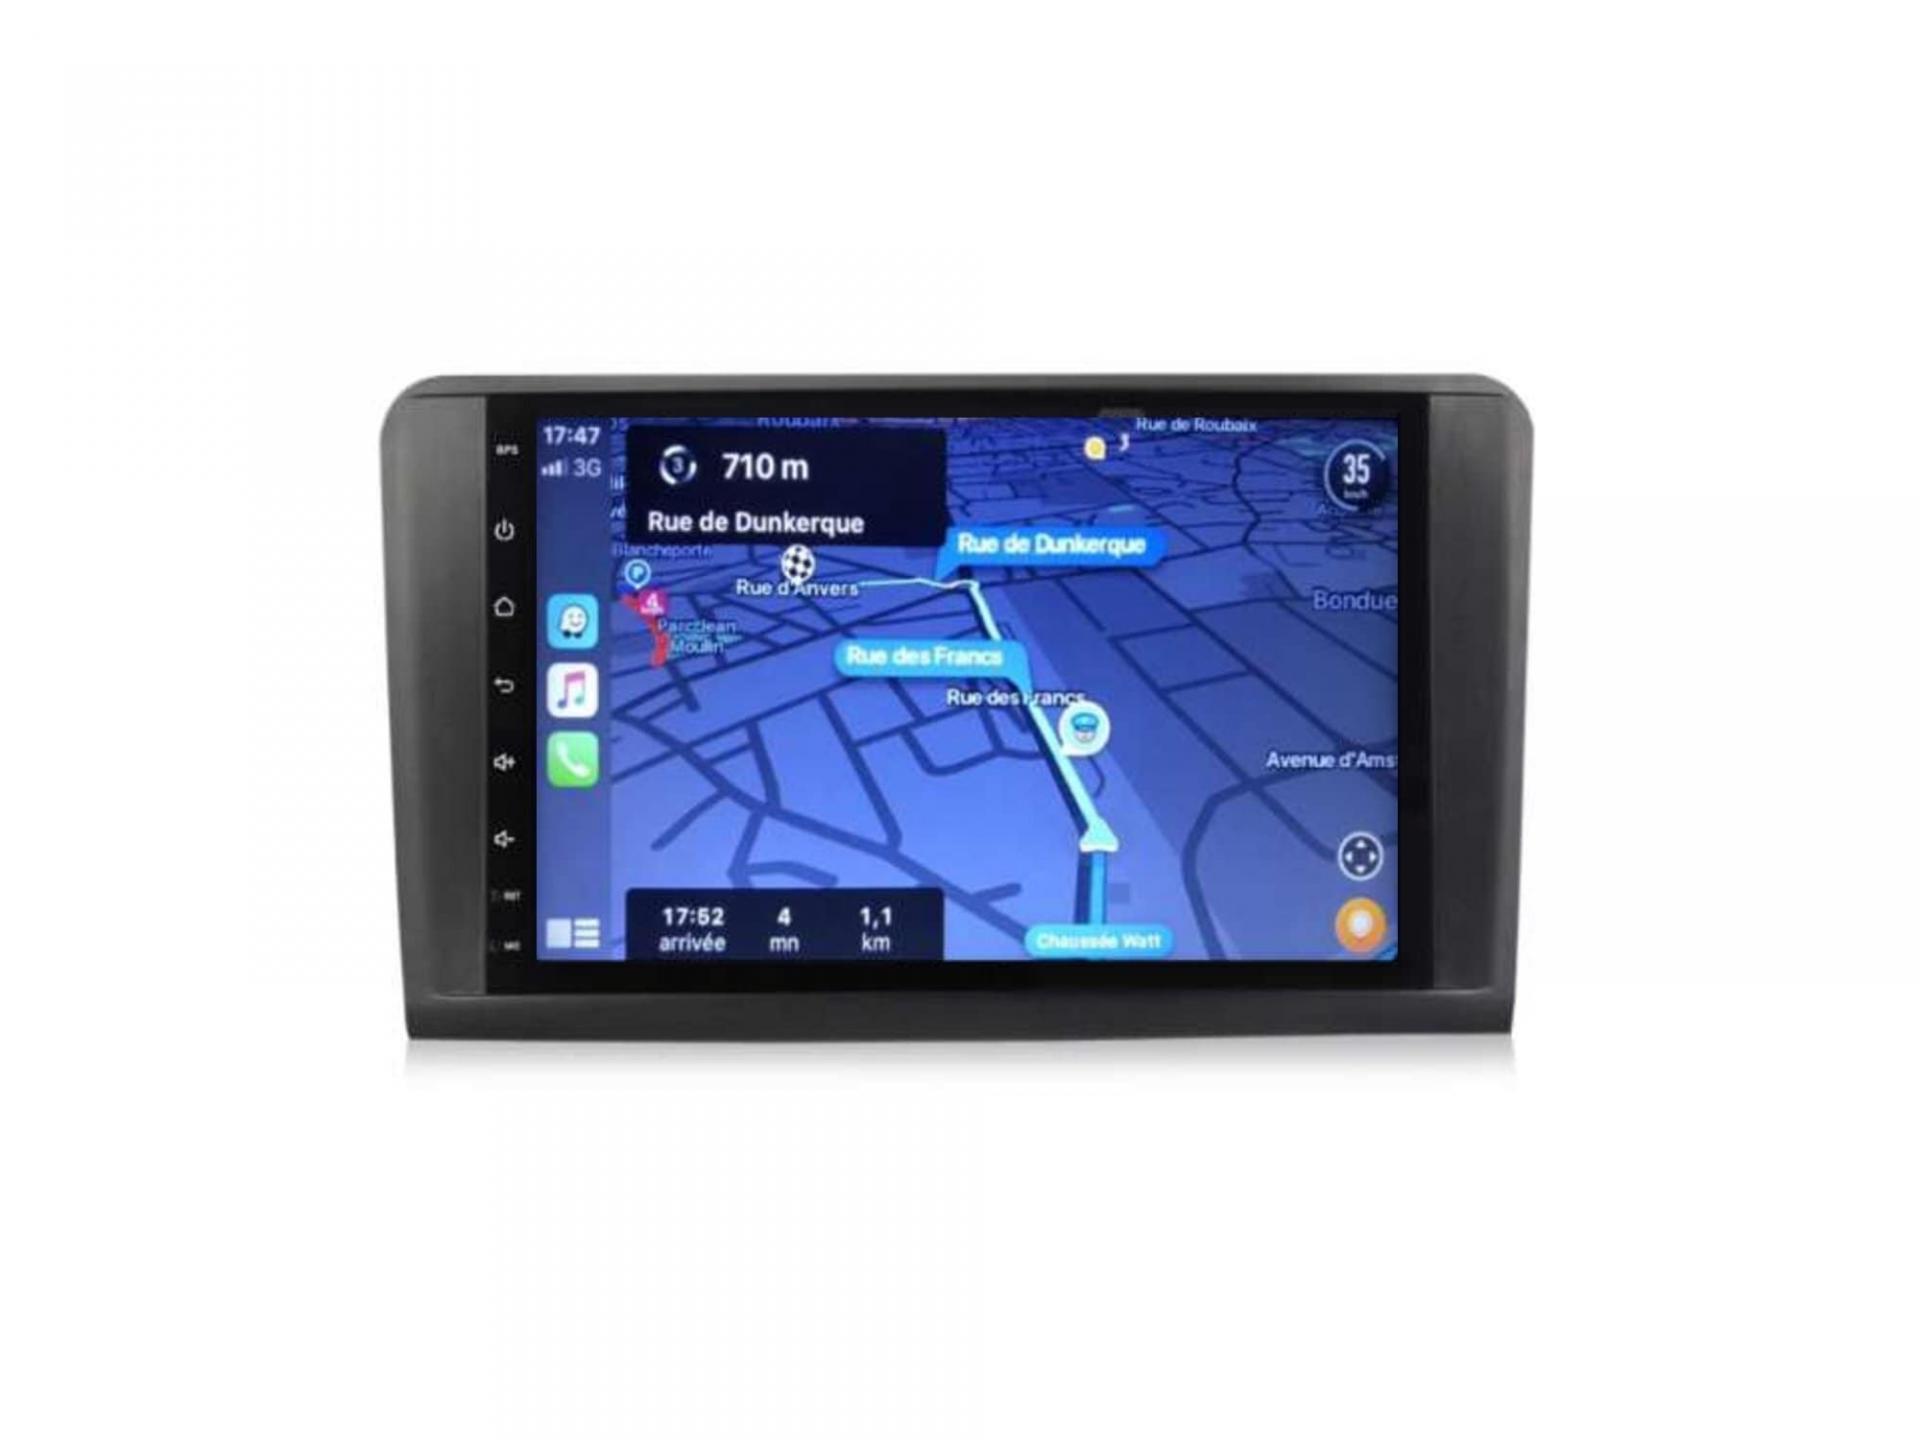 Autoradio gps carplay android auto bluetooth mercedes ml w164 gl x164 5